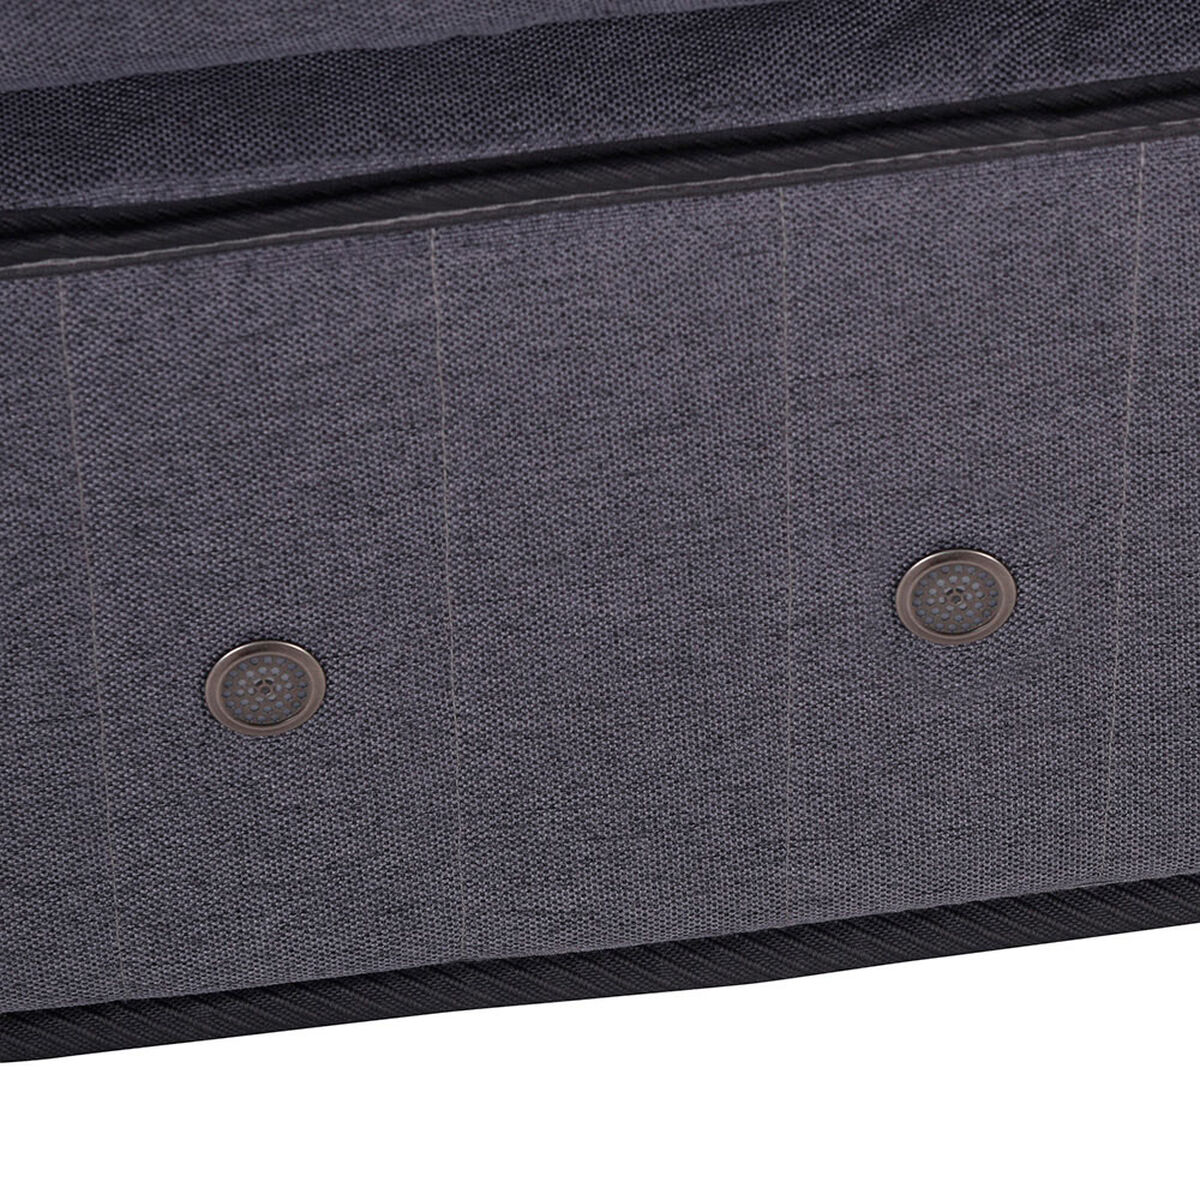 Box Spring Gran Premium CIC 2 Pl Div + Set Maderas Miro